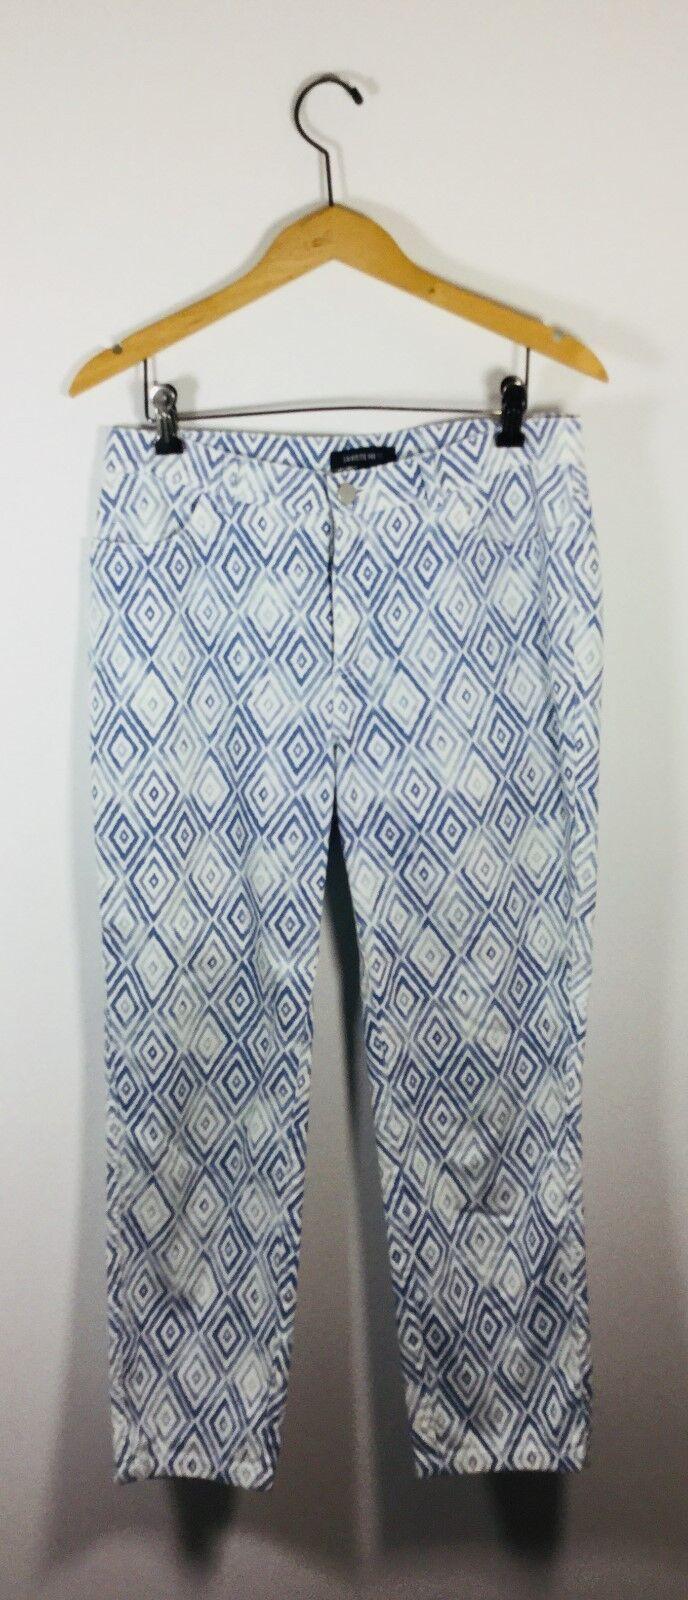 LAFAYETTE 148 bluee Geometric Print Crop Straight Leg Pant Size 6